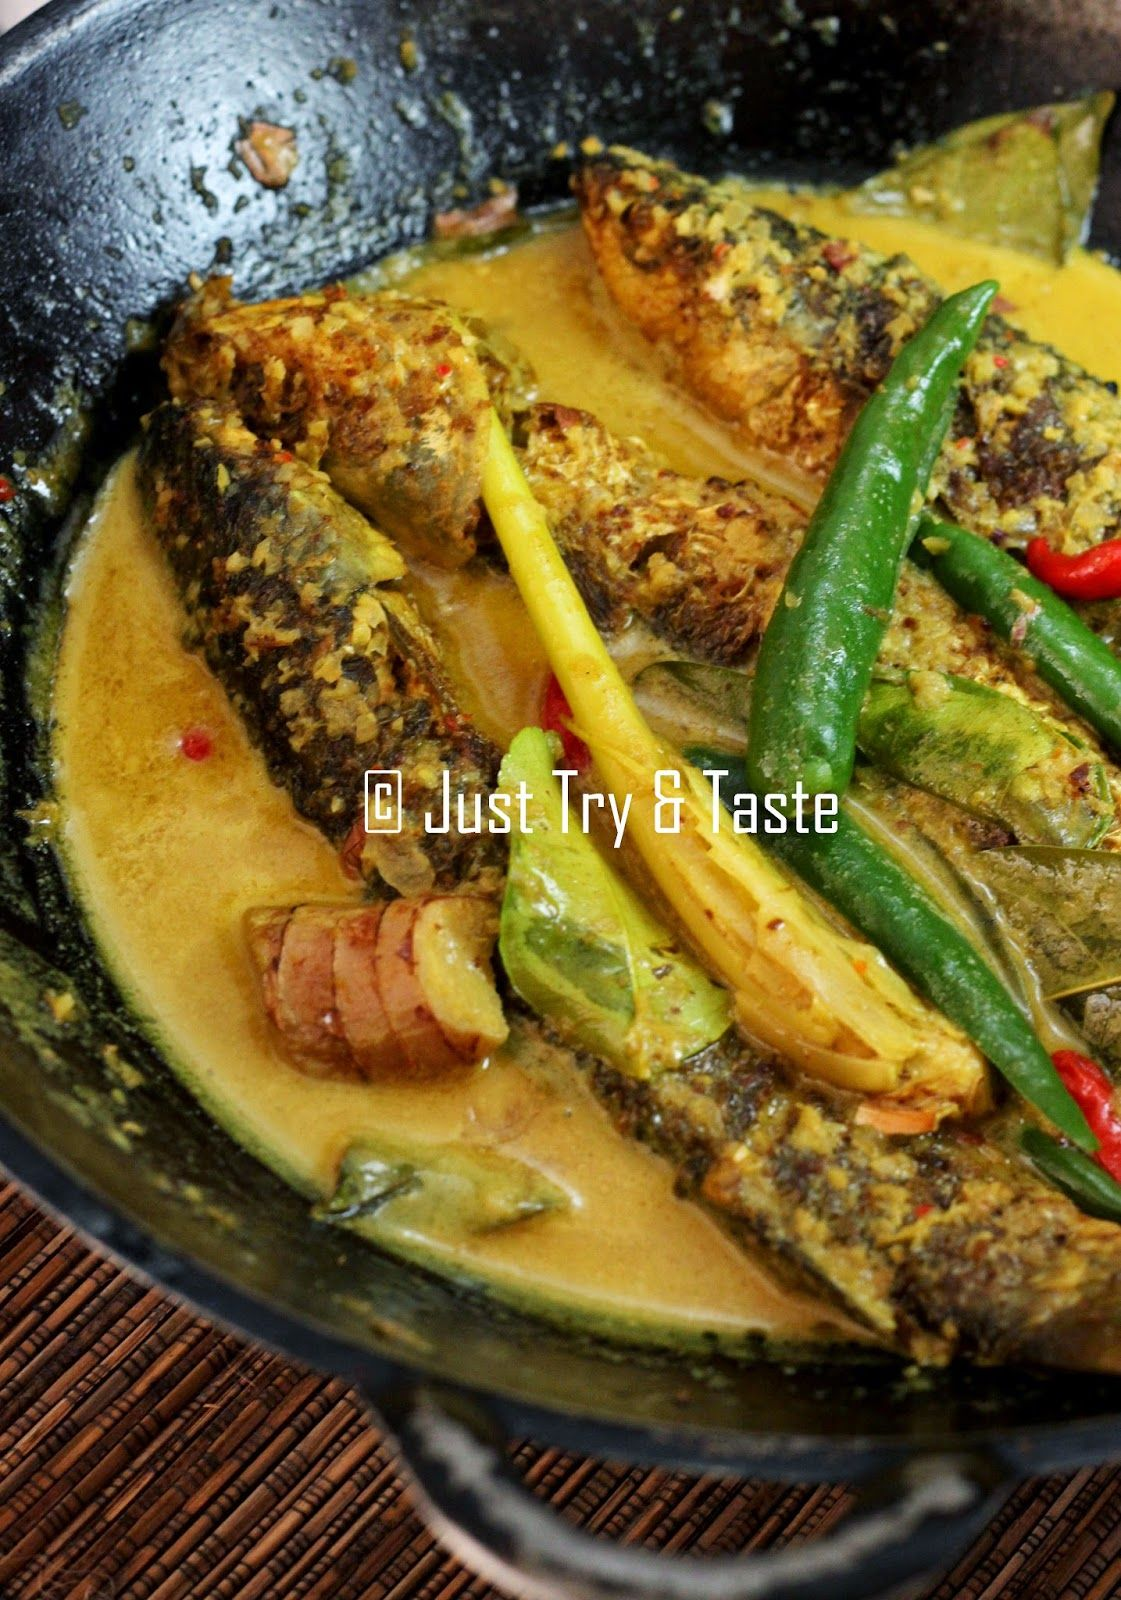 Resep Mangut Ikan Pe Pari Asap Resep Masakan Indonesia Masakan Masakan Indonesia